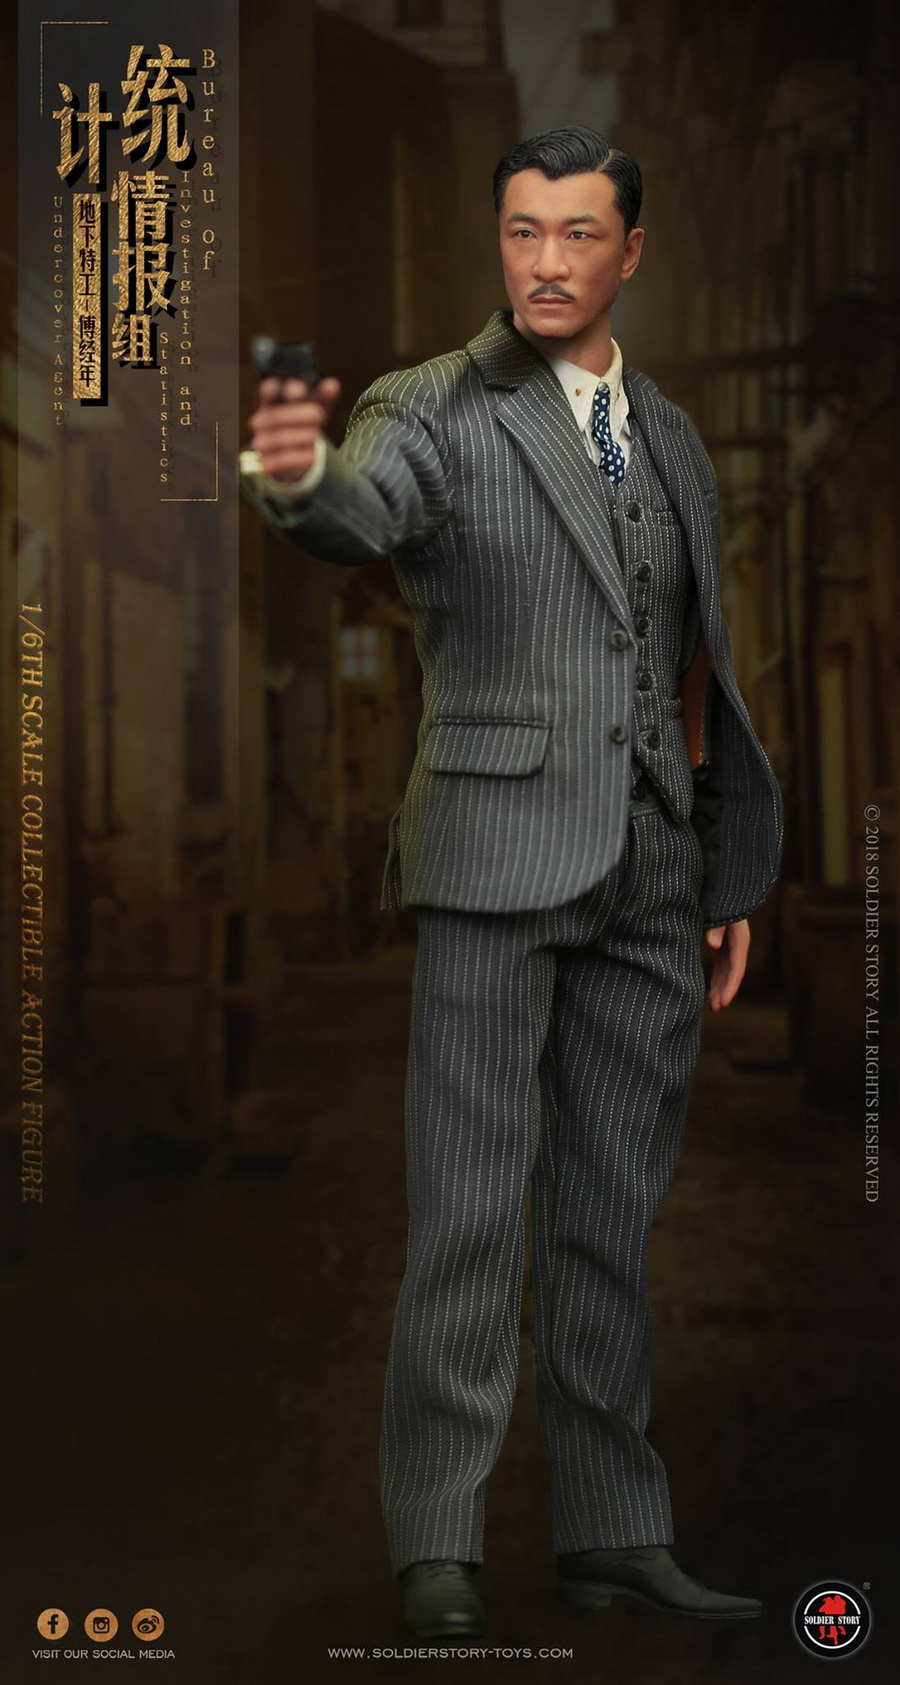 sost-Undercover Agent02